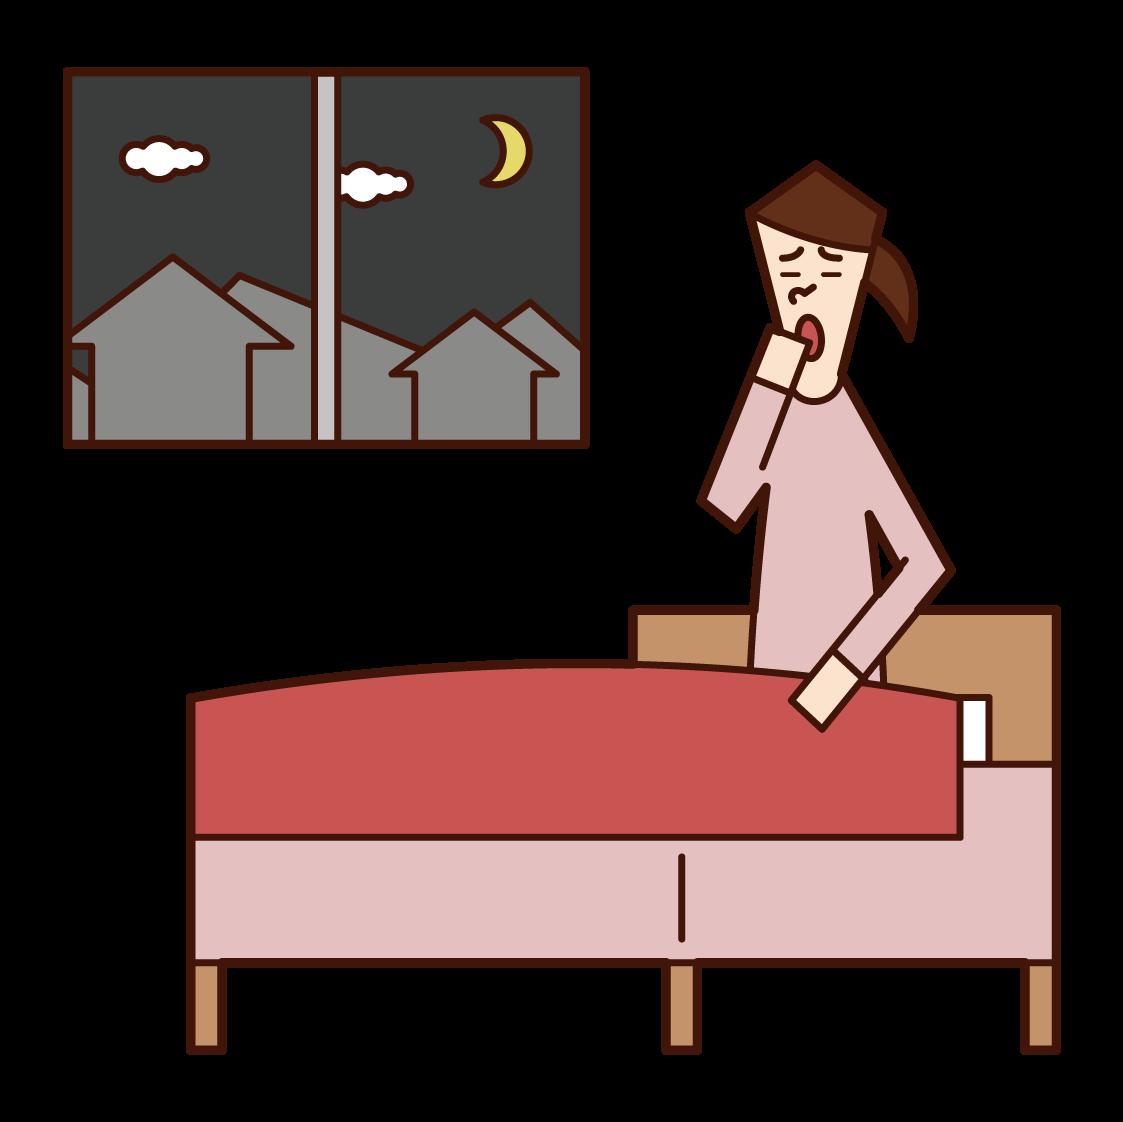 Illustration of a woman who sleeps